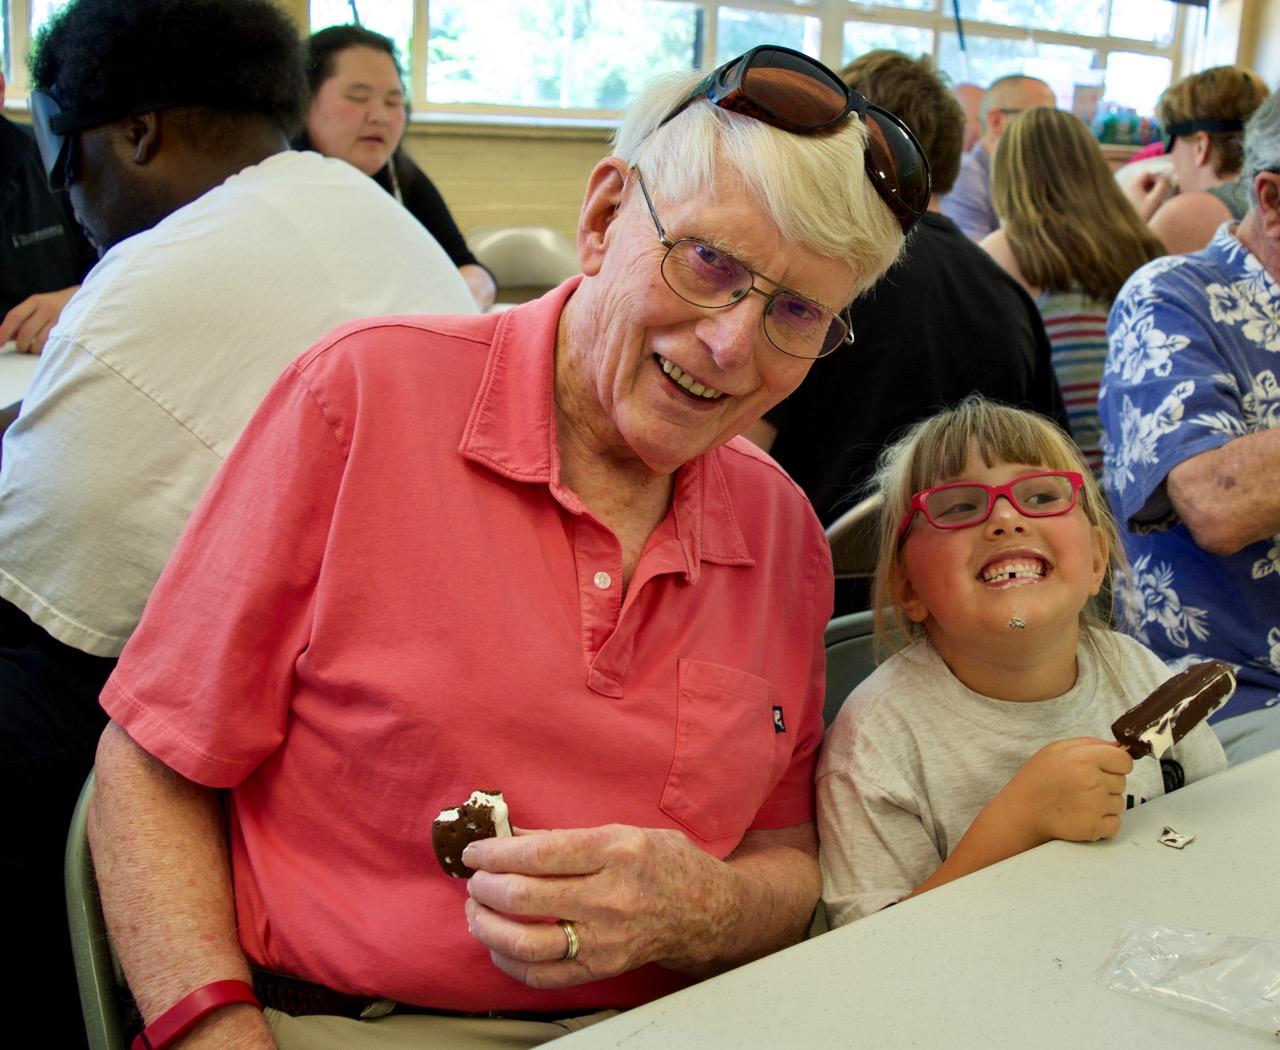 Ron age 83 sitting next to Peityn age 6 both enjoying ice cream